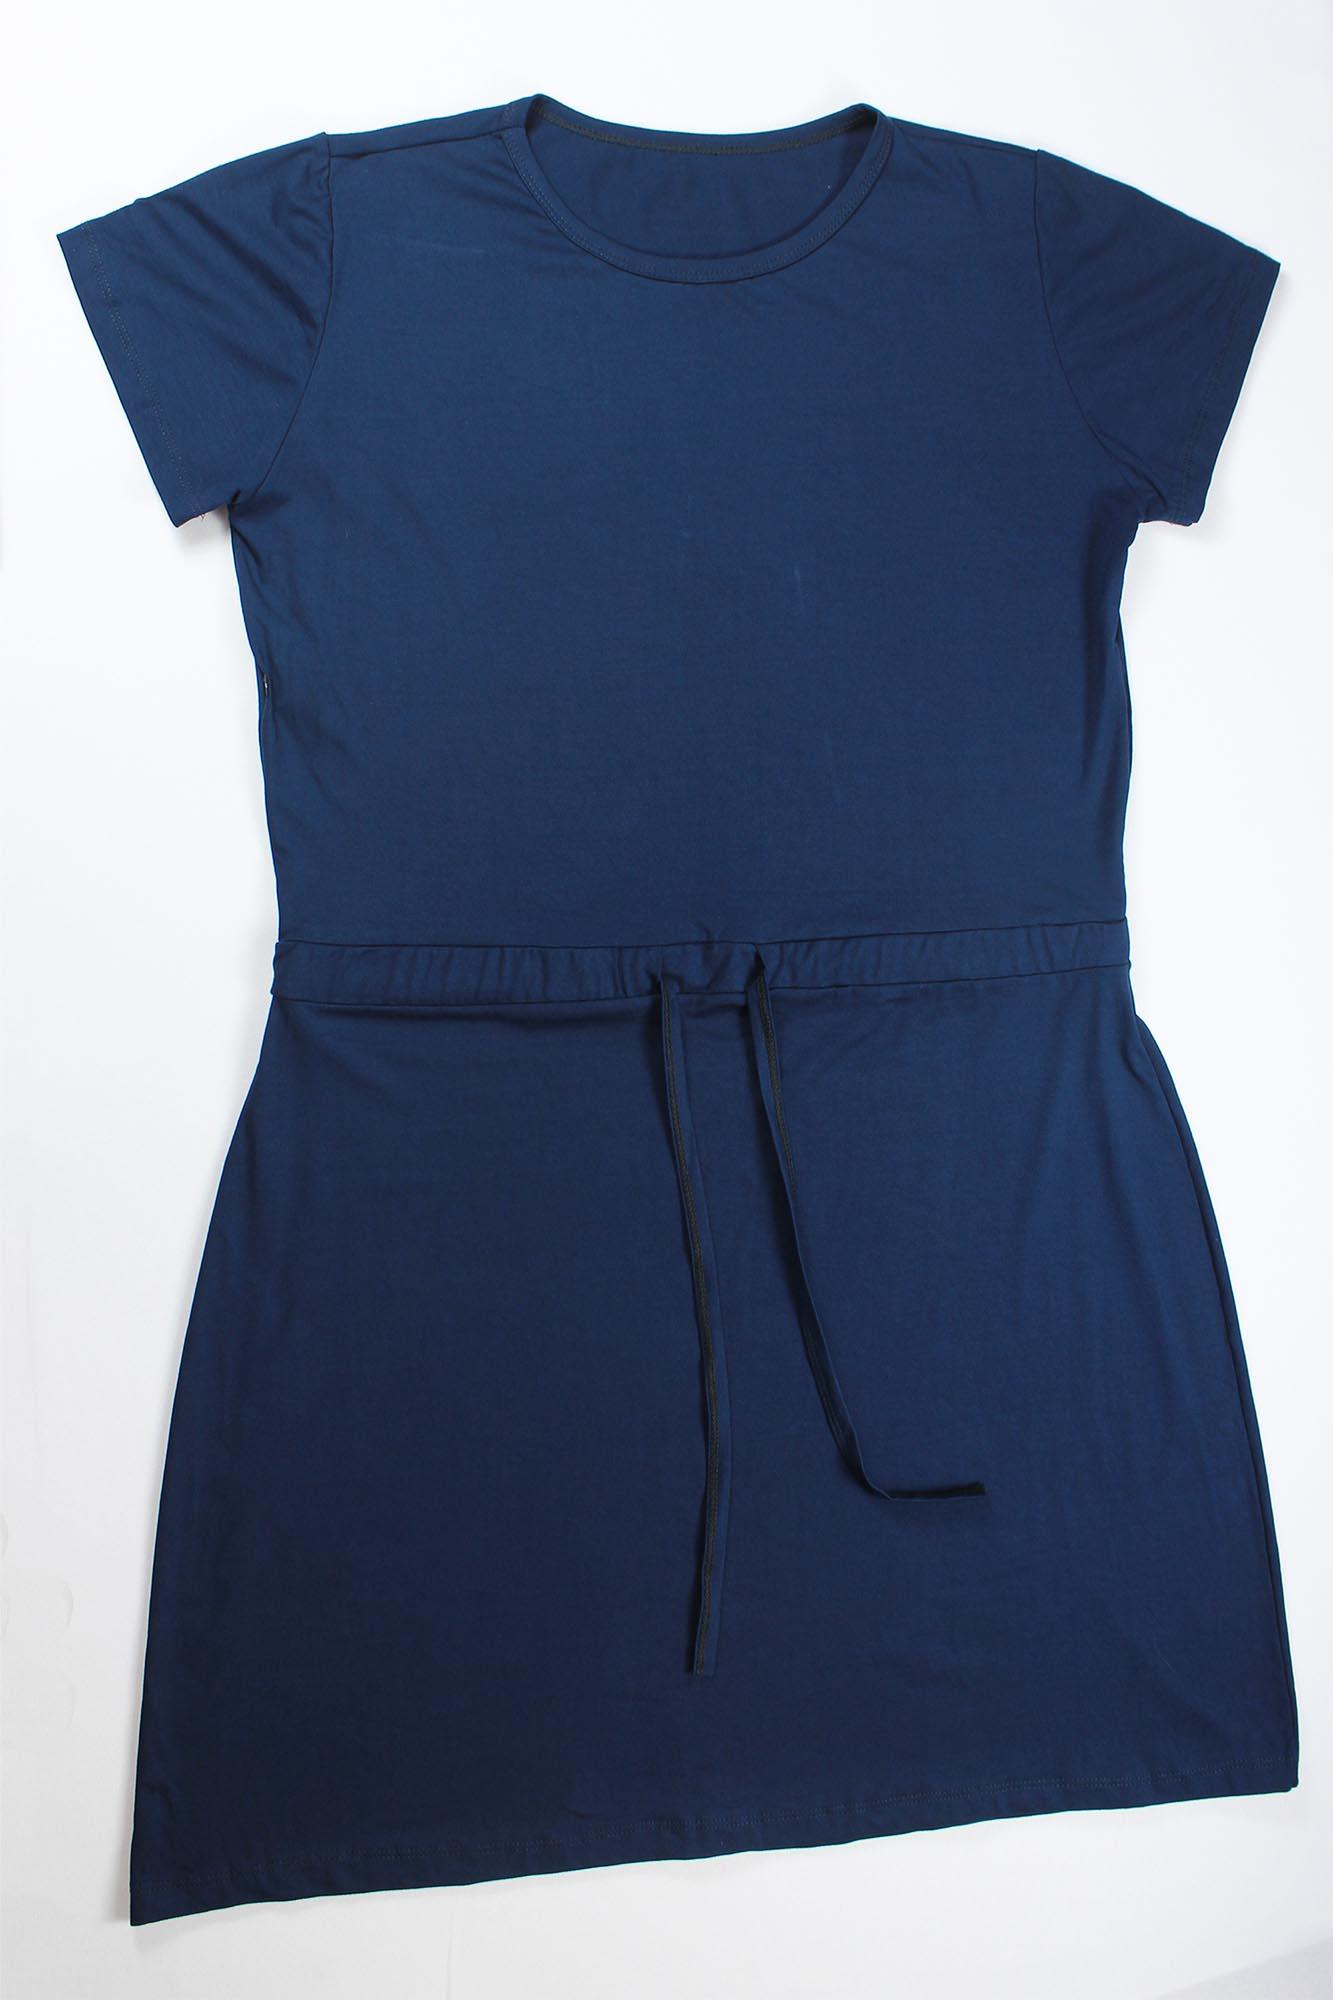 Vestido Curto de Amarrar Feminino - Azul Marinho